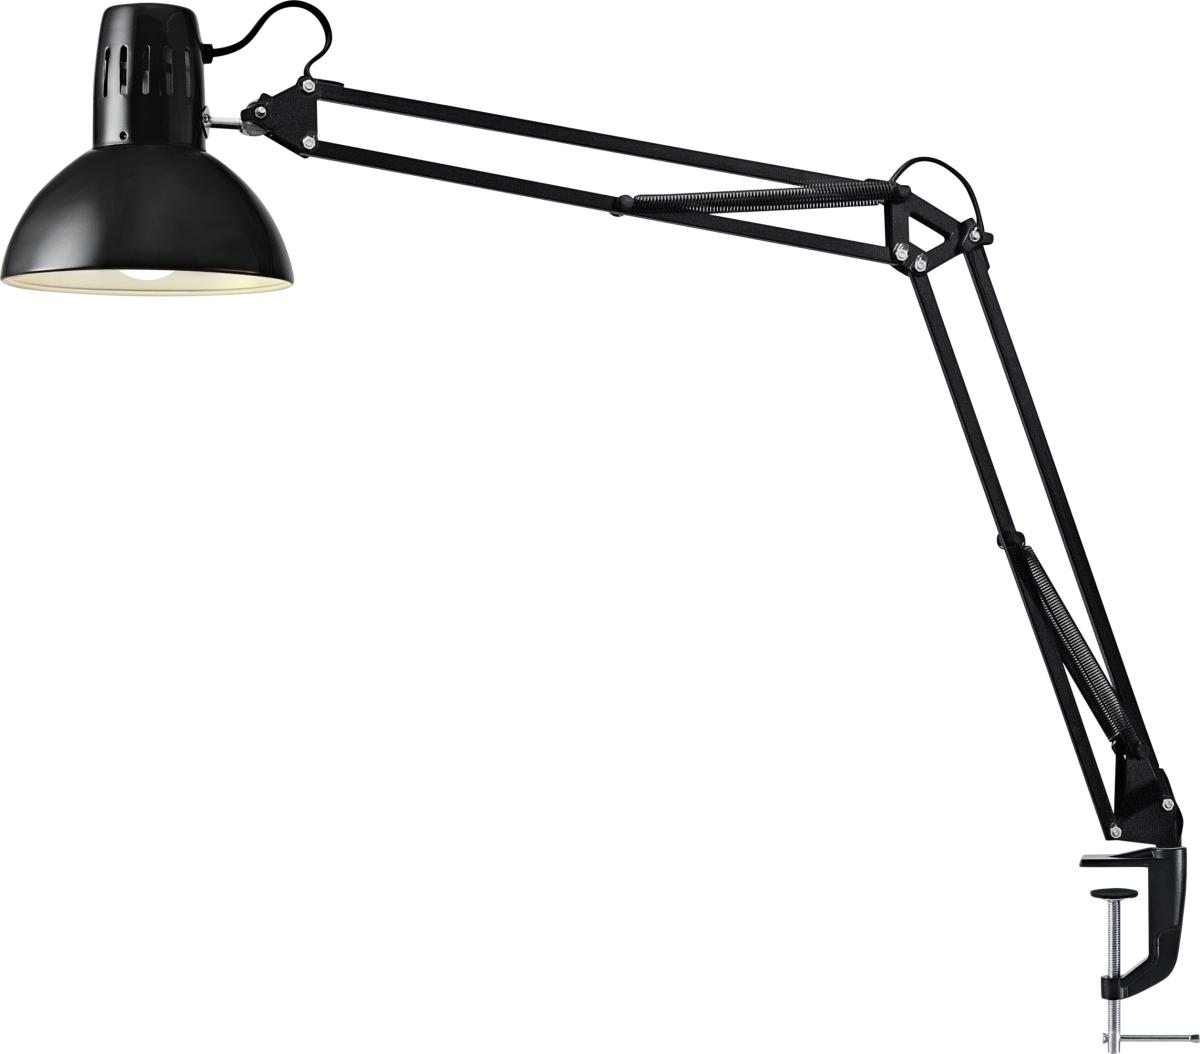 arkitektlampe Manhattan LED Arkitektlampe, sort m/ klemme   køb til fast lav  arkitektlampe